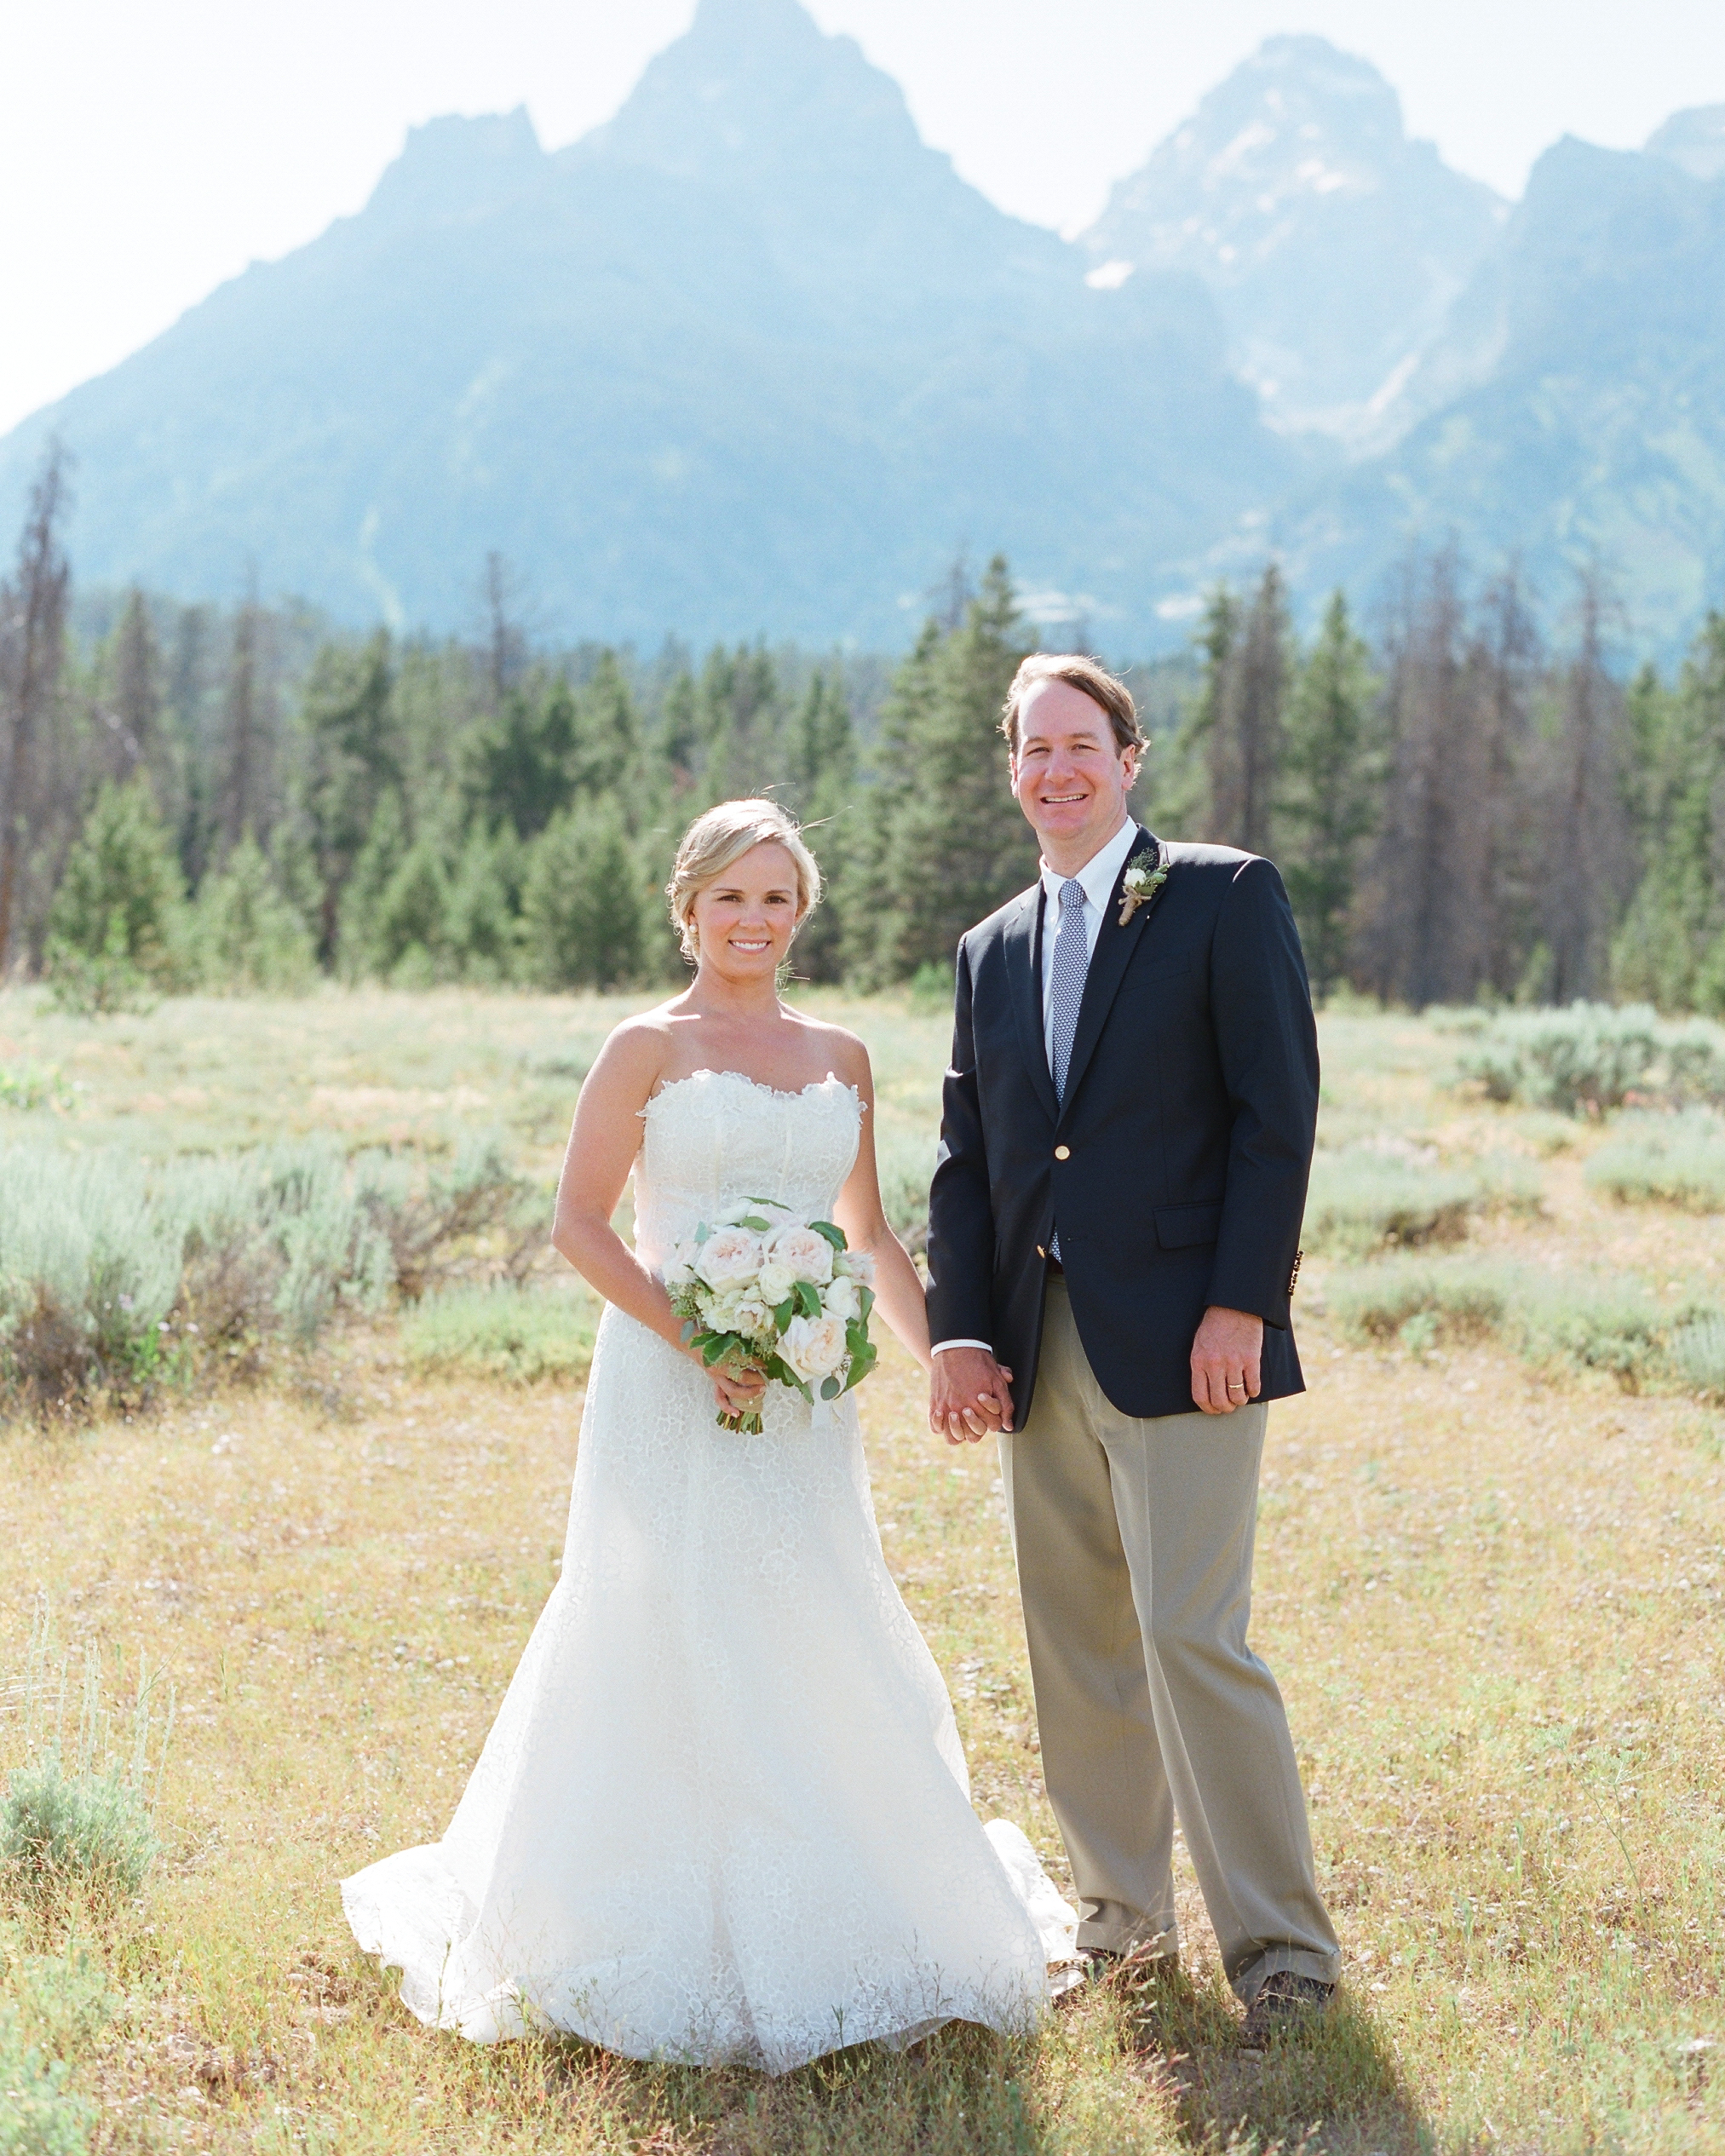 elizabeth-scott-wedding-portrait4-0314.jpg